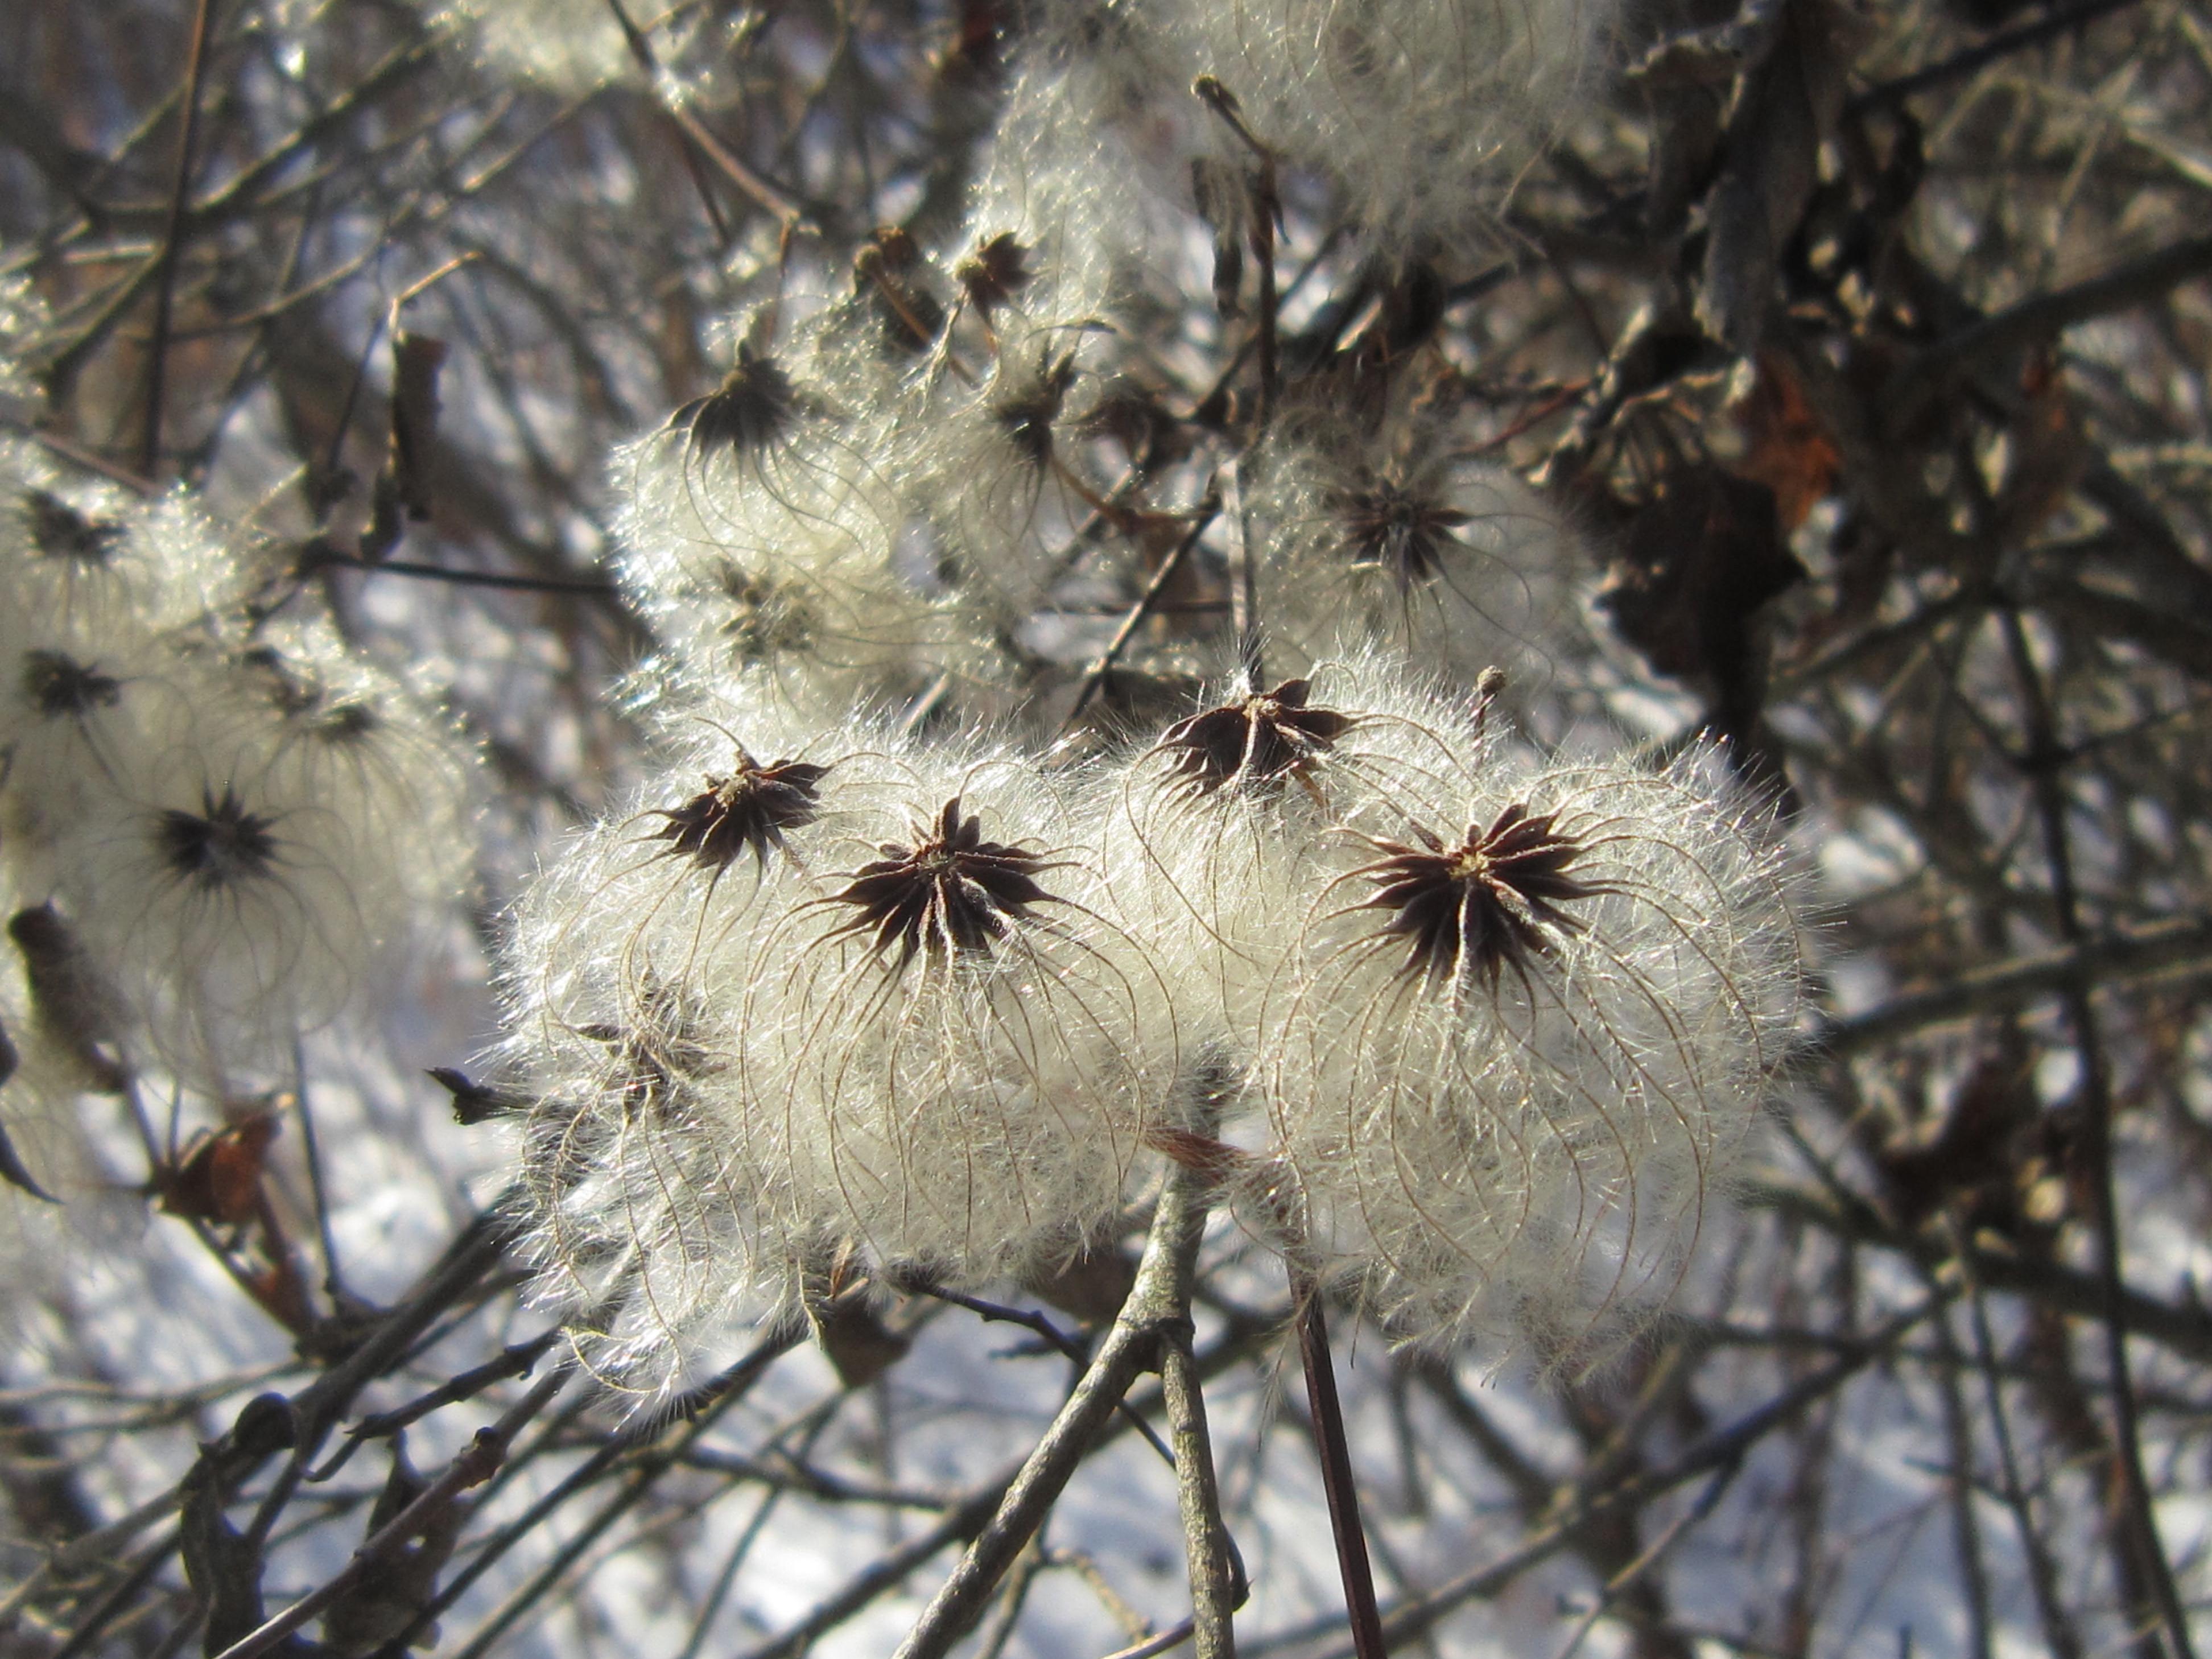 Seeds of Virgin's Bower